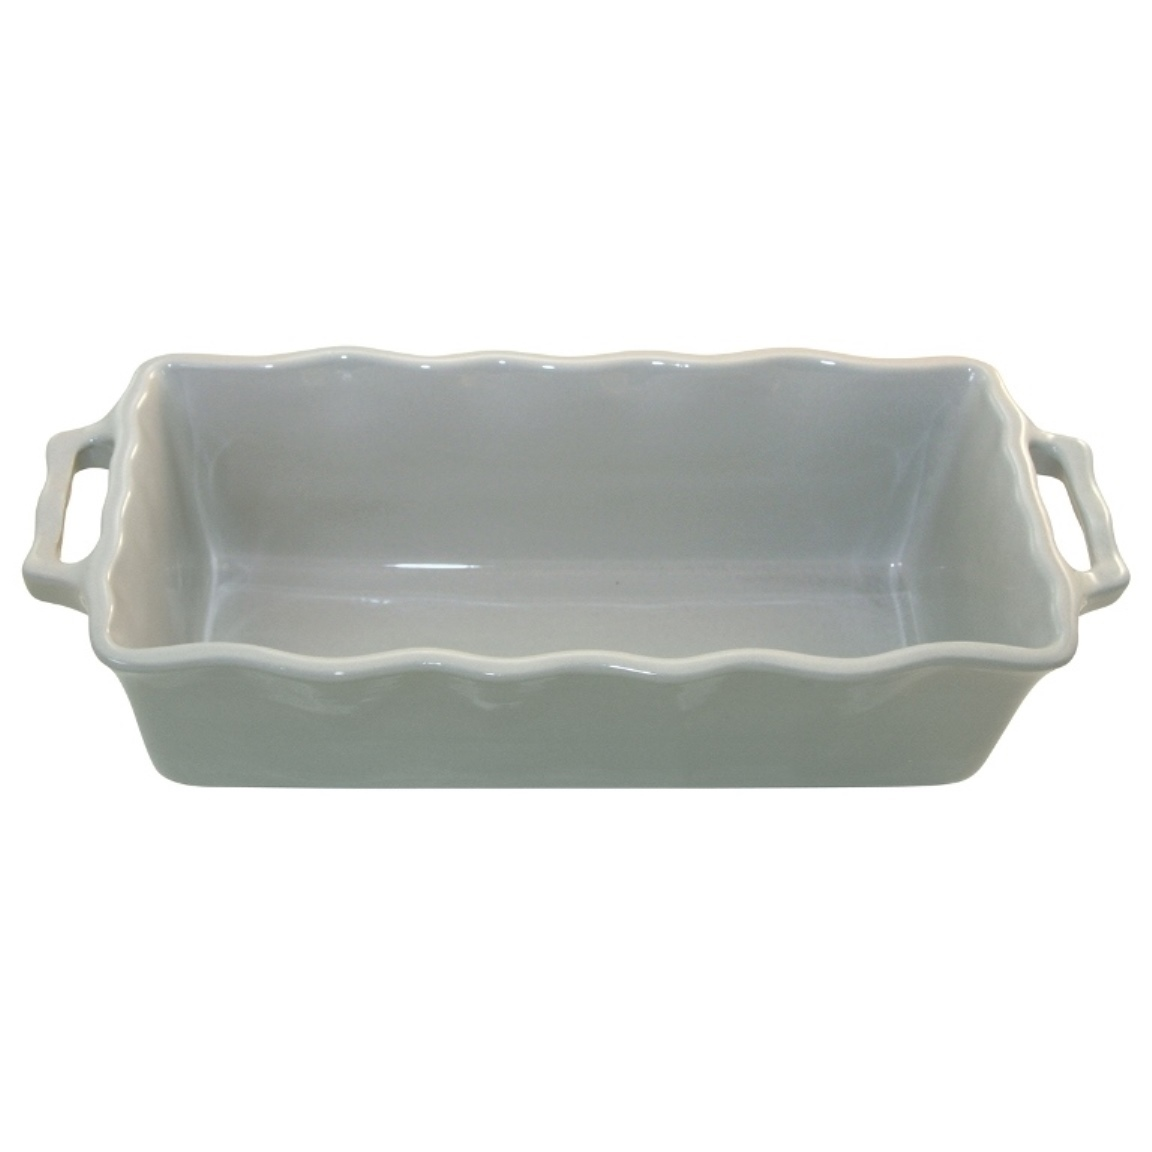 Форма для кекса 33 см Appolia Delices MEDIUM GREY 112033078